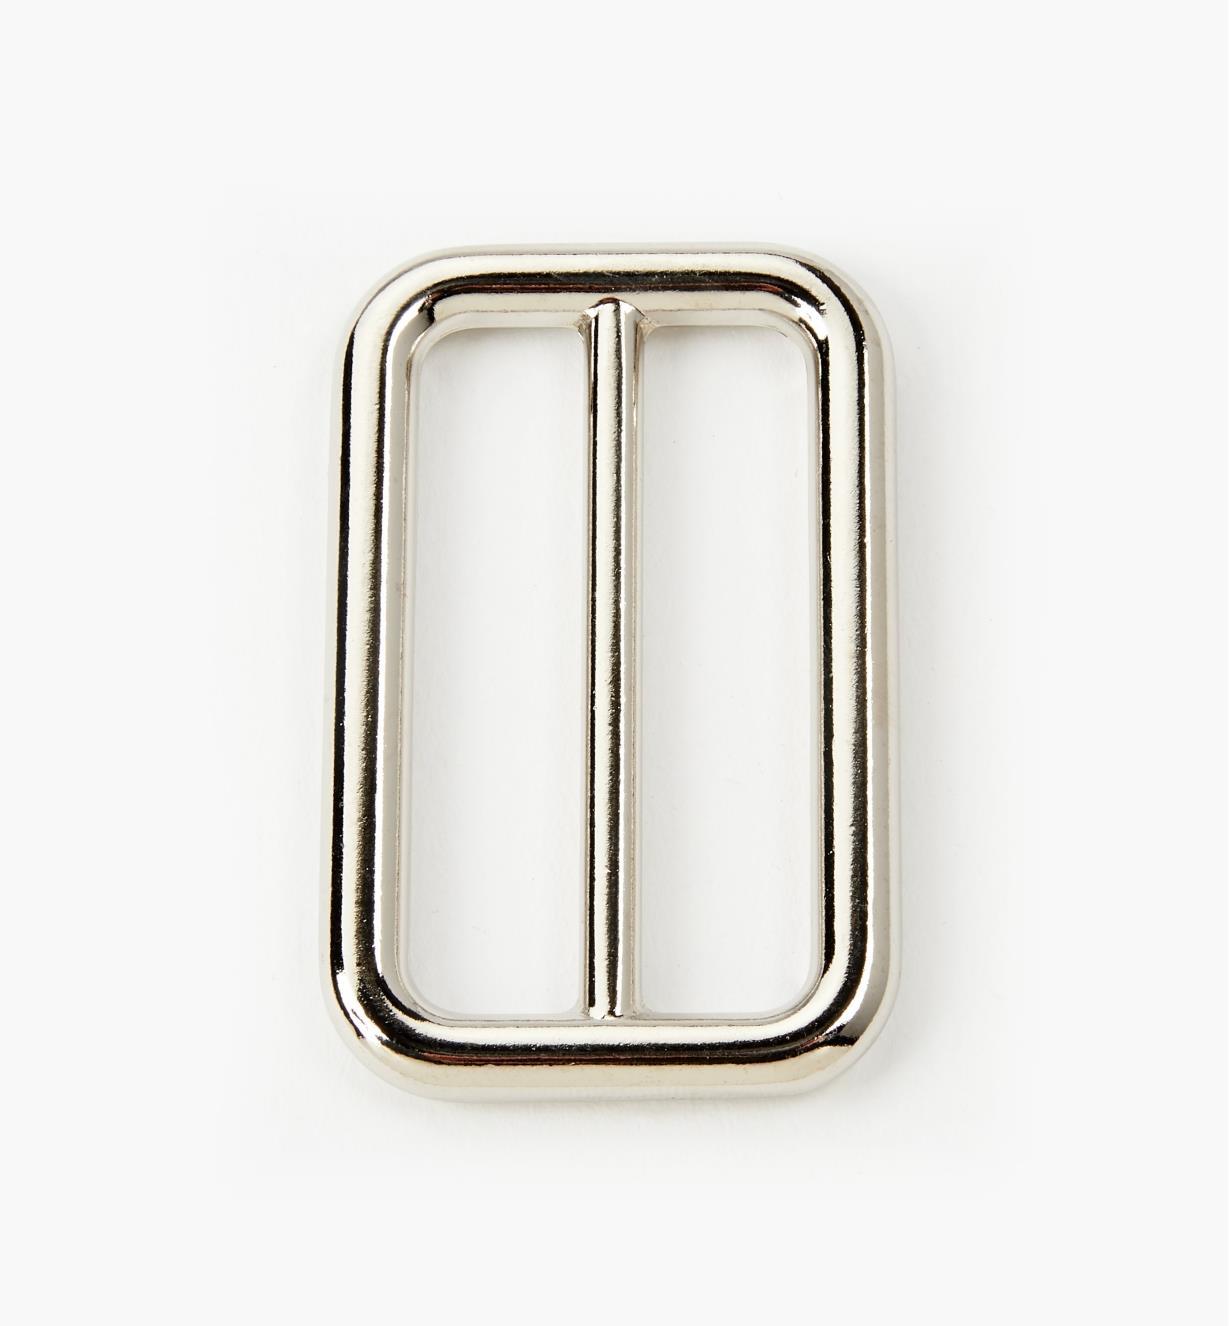 91Z5162 - ABC Morini 40mm x 23mm Nickel Plate Strap Keeper